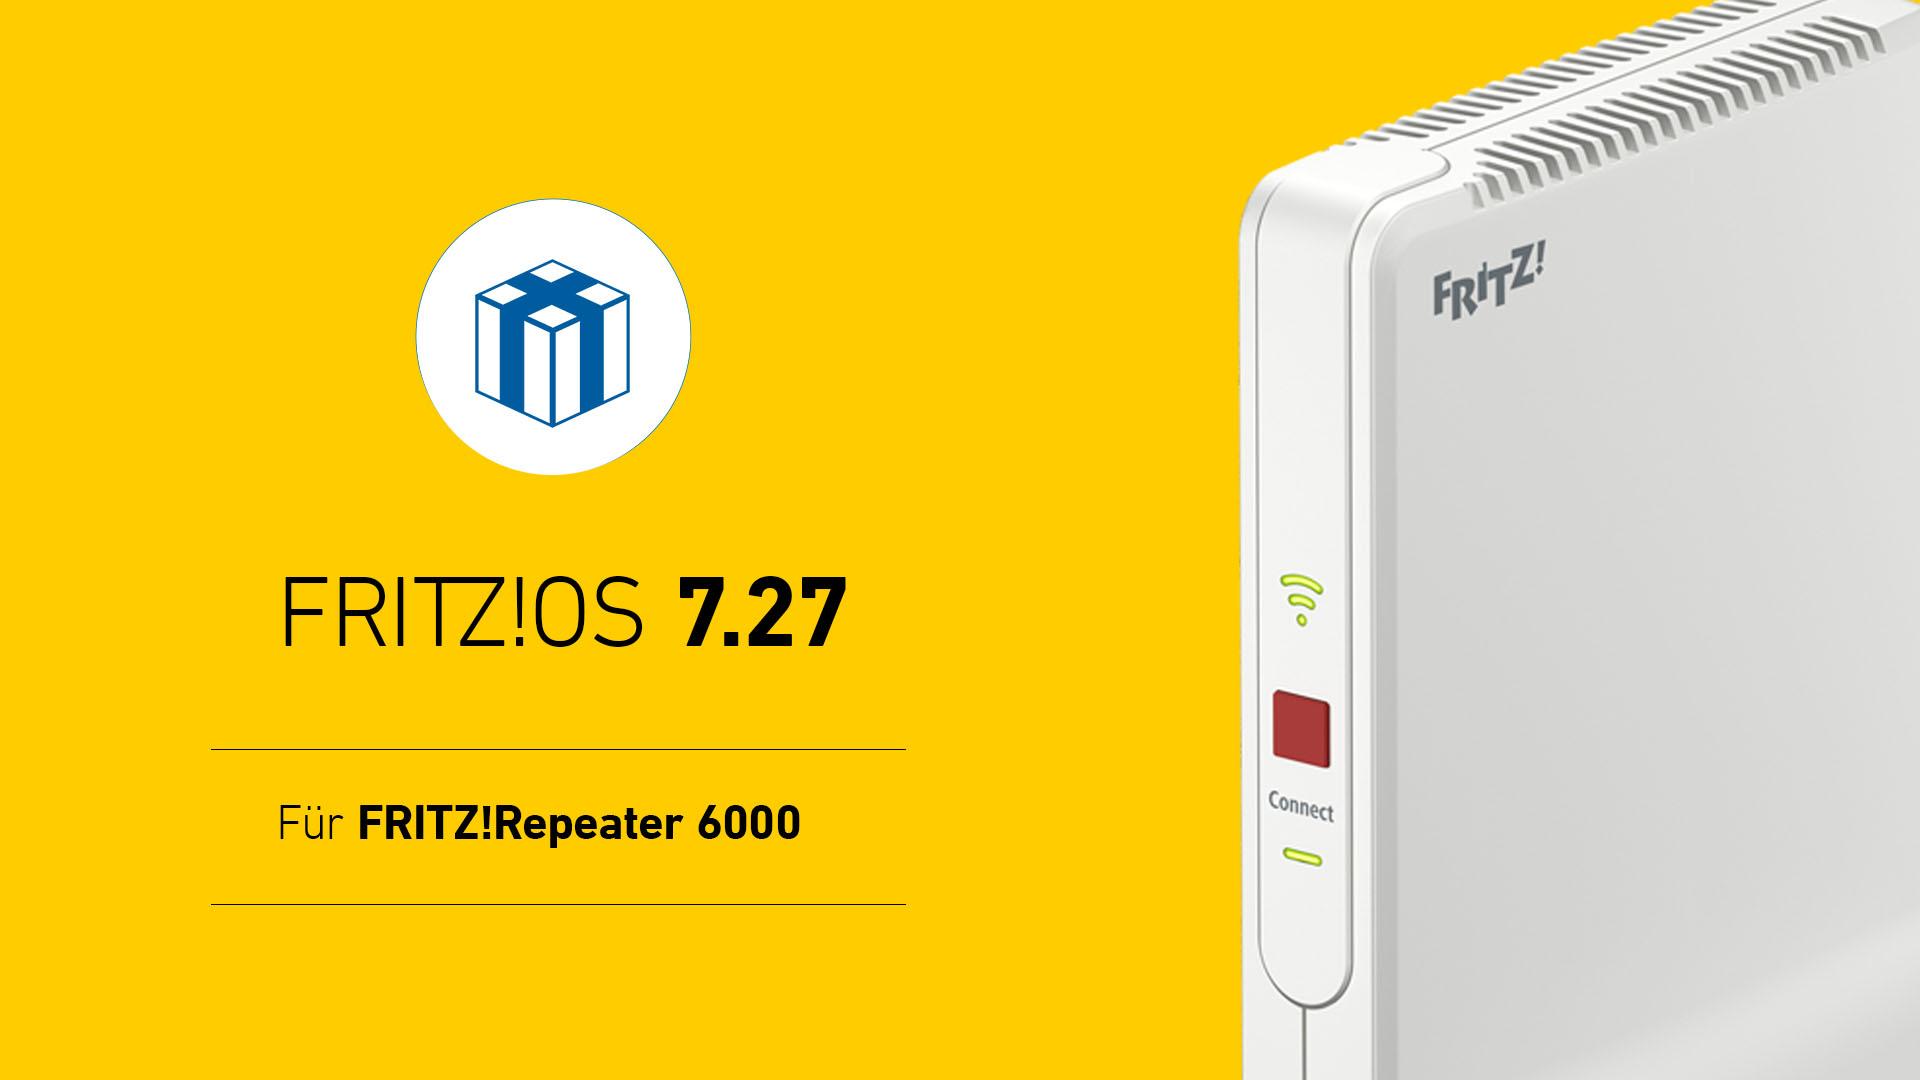 FritzOS 20.220 FritzRepeater 20 erhält das Update   COMPUTER BILD